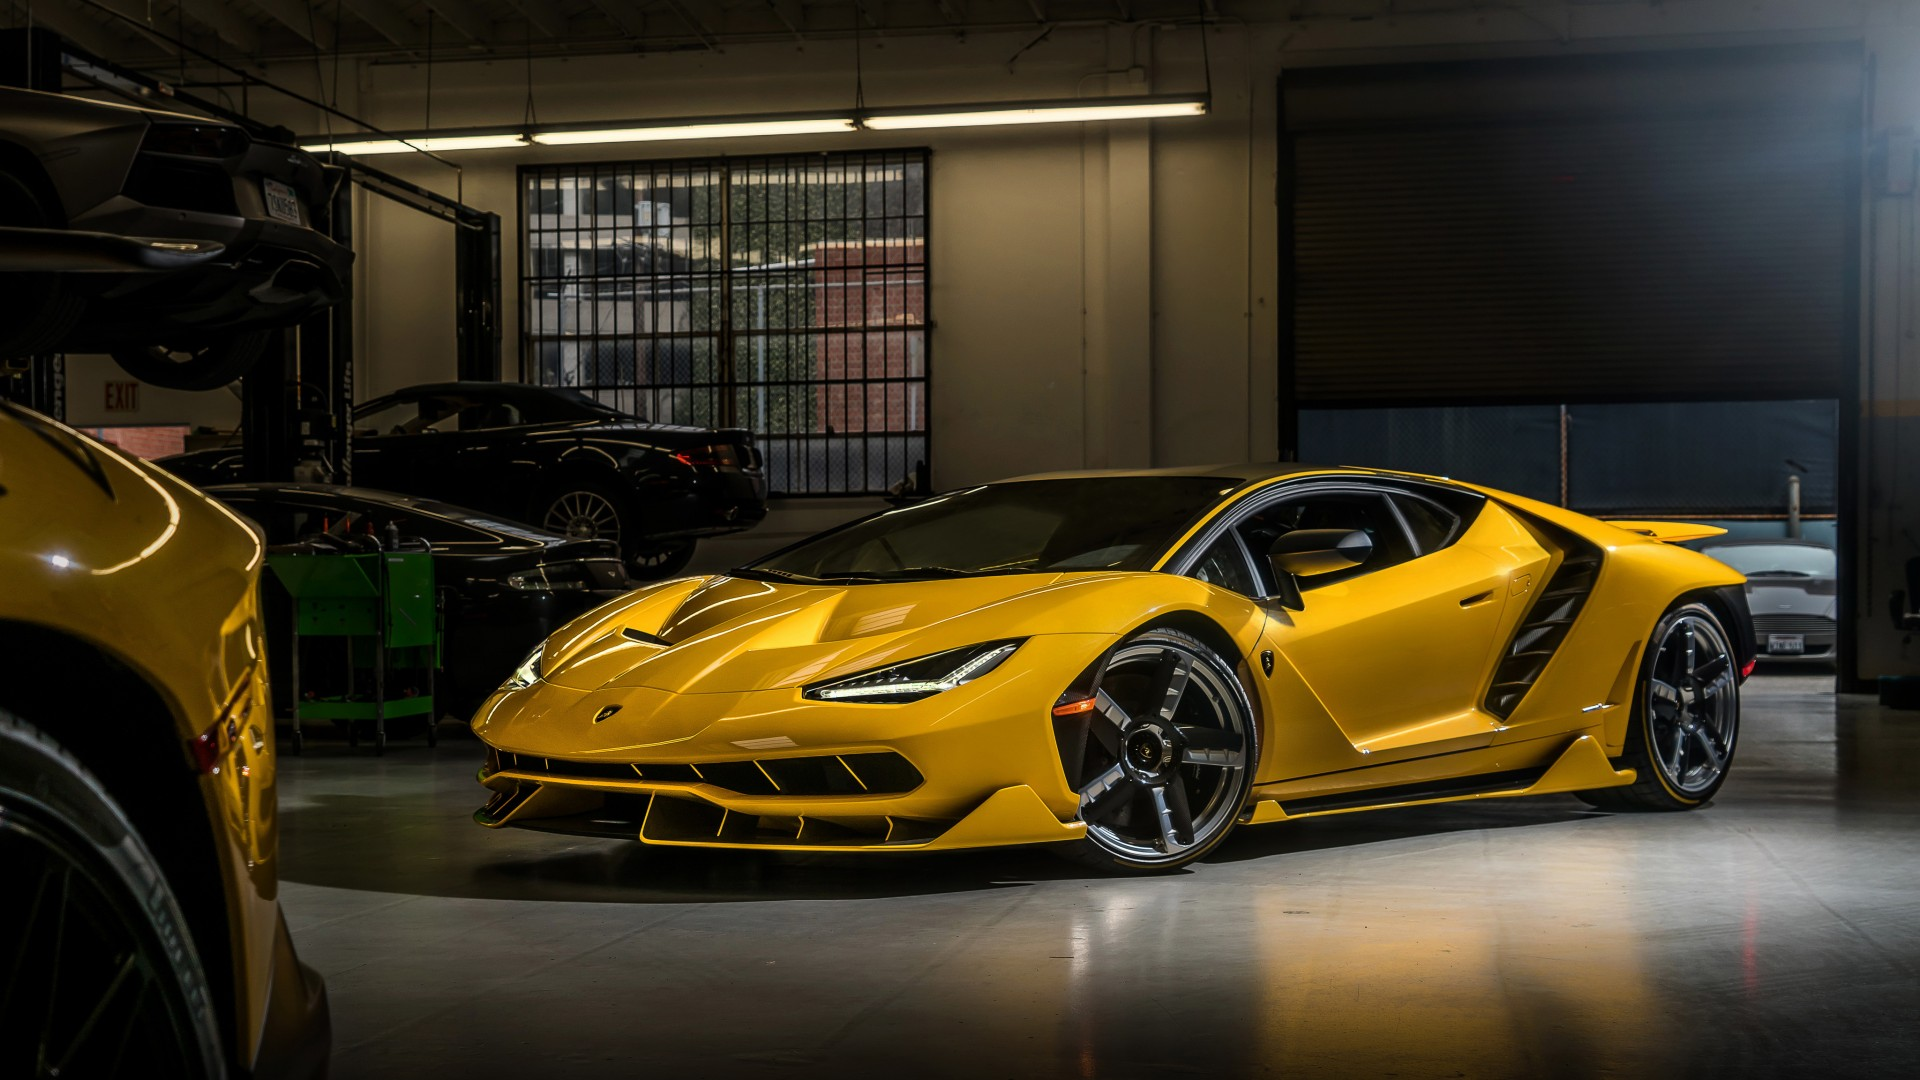 Lamborghini Centenario Coupe 4K Wallpaper | HD Car ...